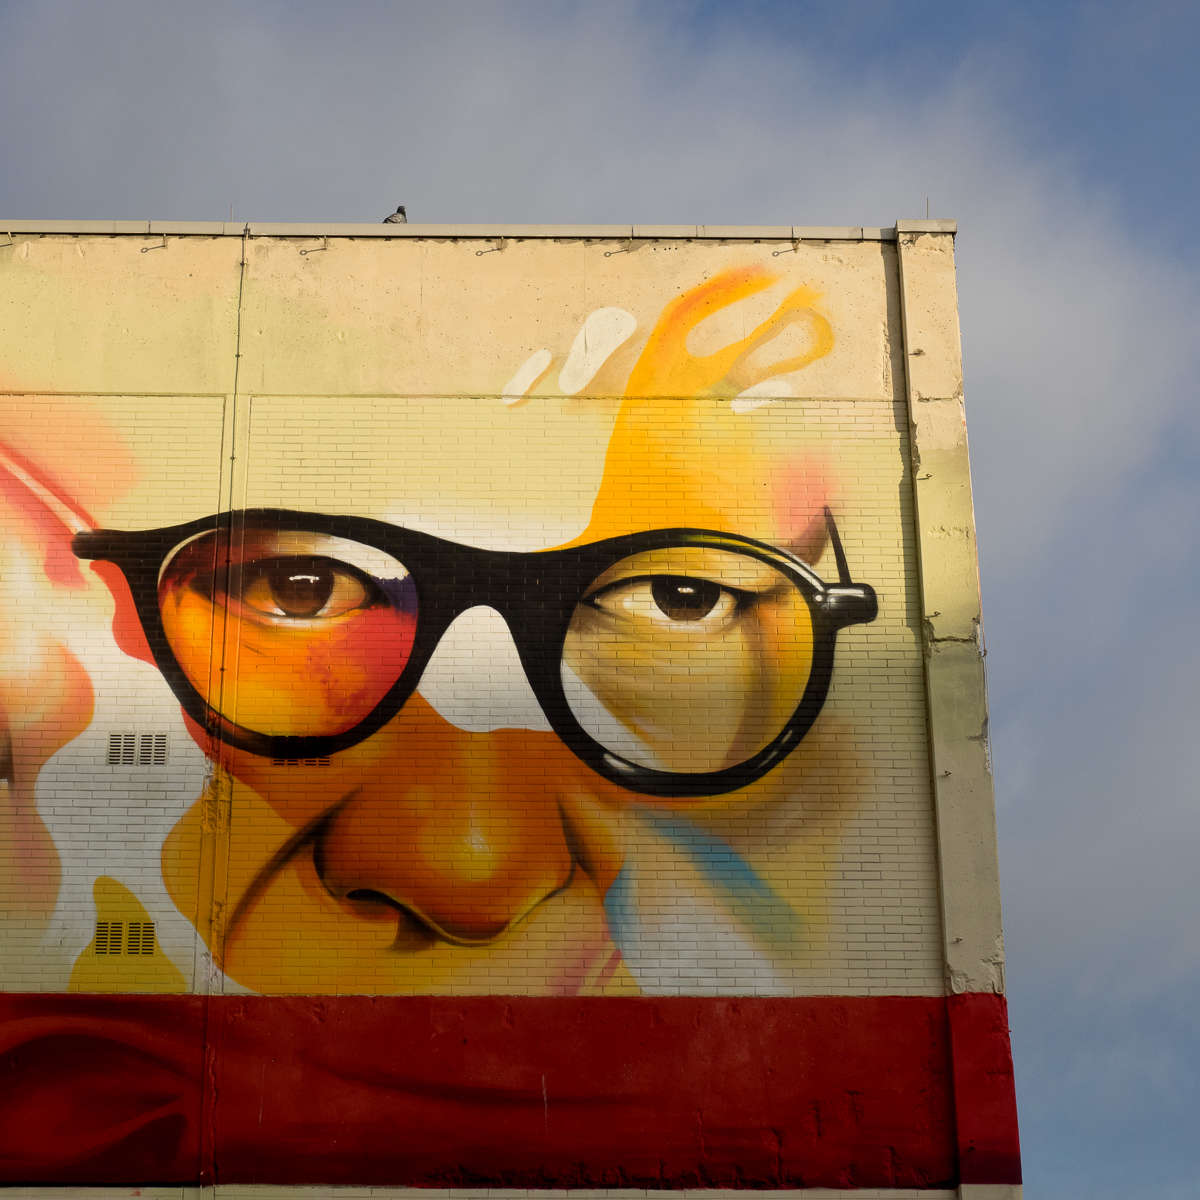 Graffiti am Campus Bockenheim in Frankfurt - Justus Becker/Cor & Oğuz Şen